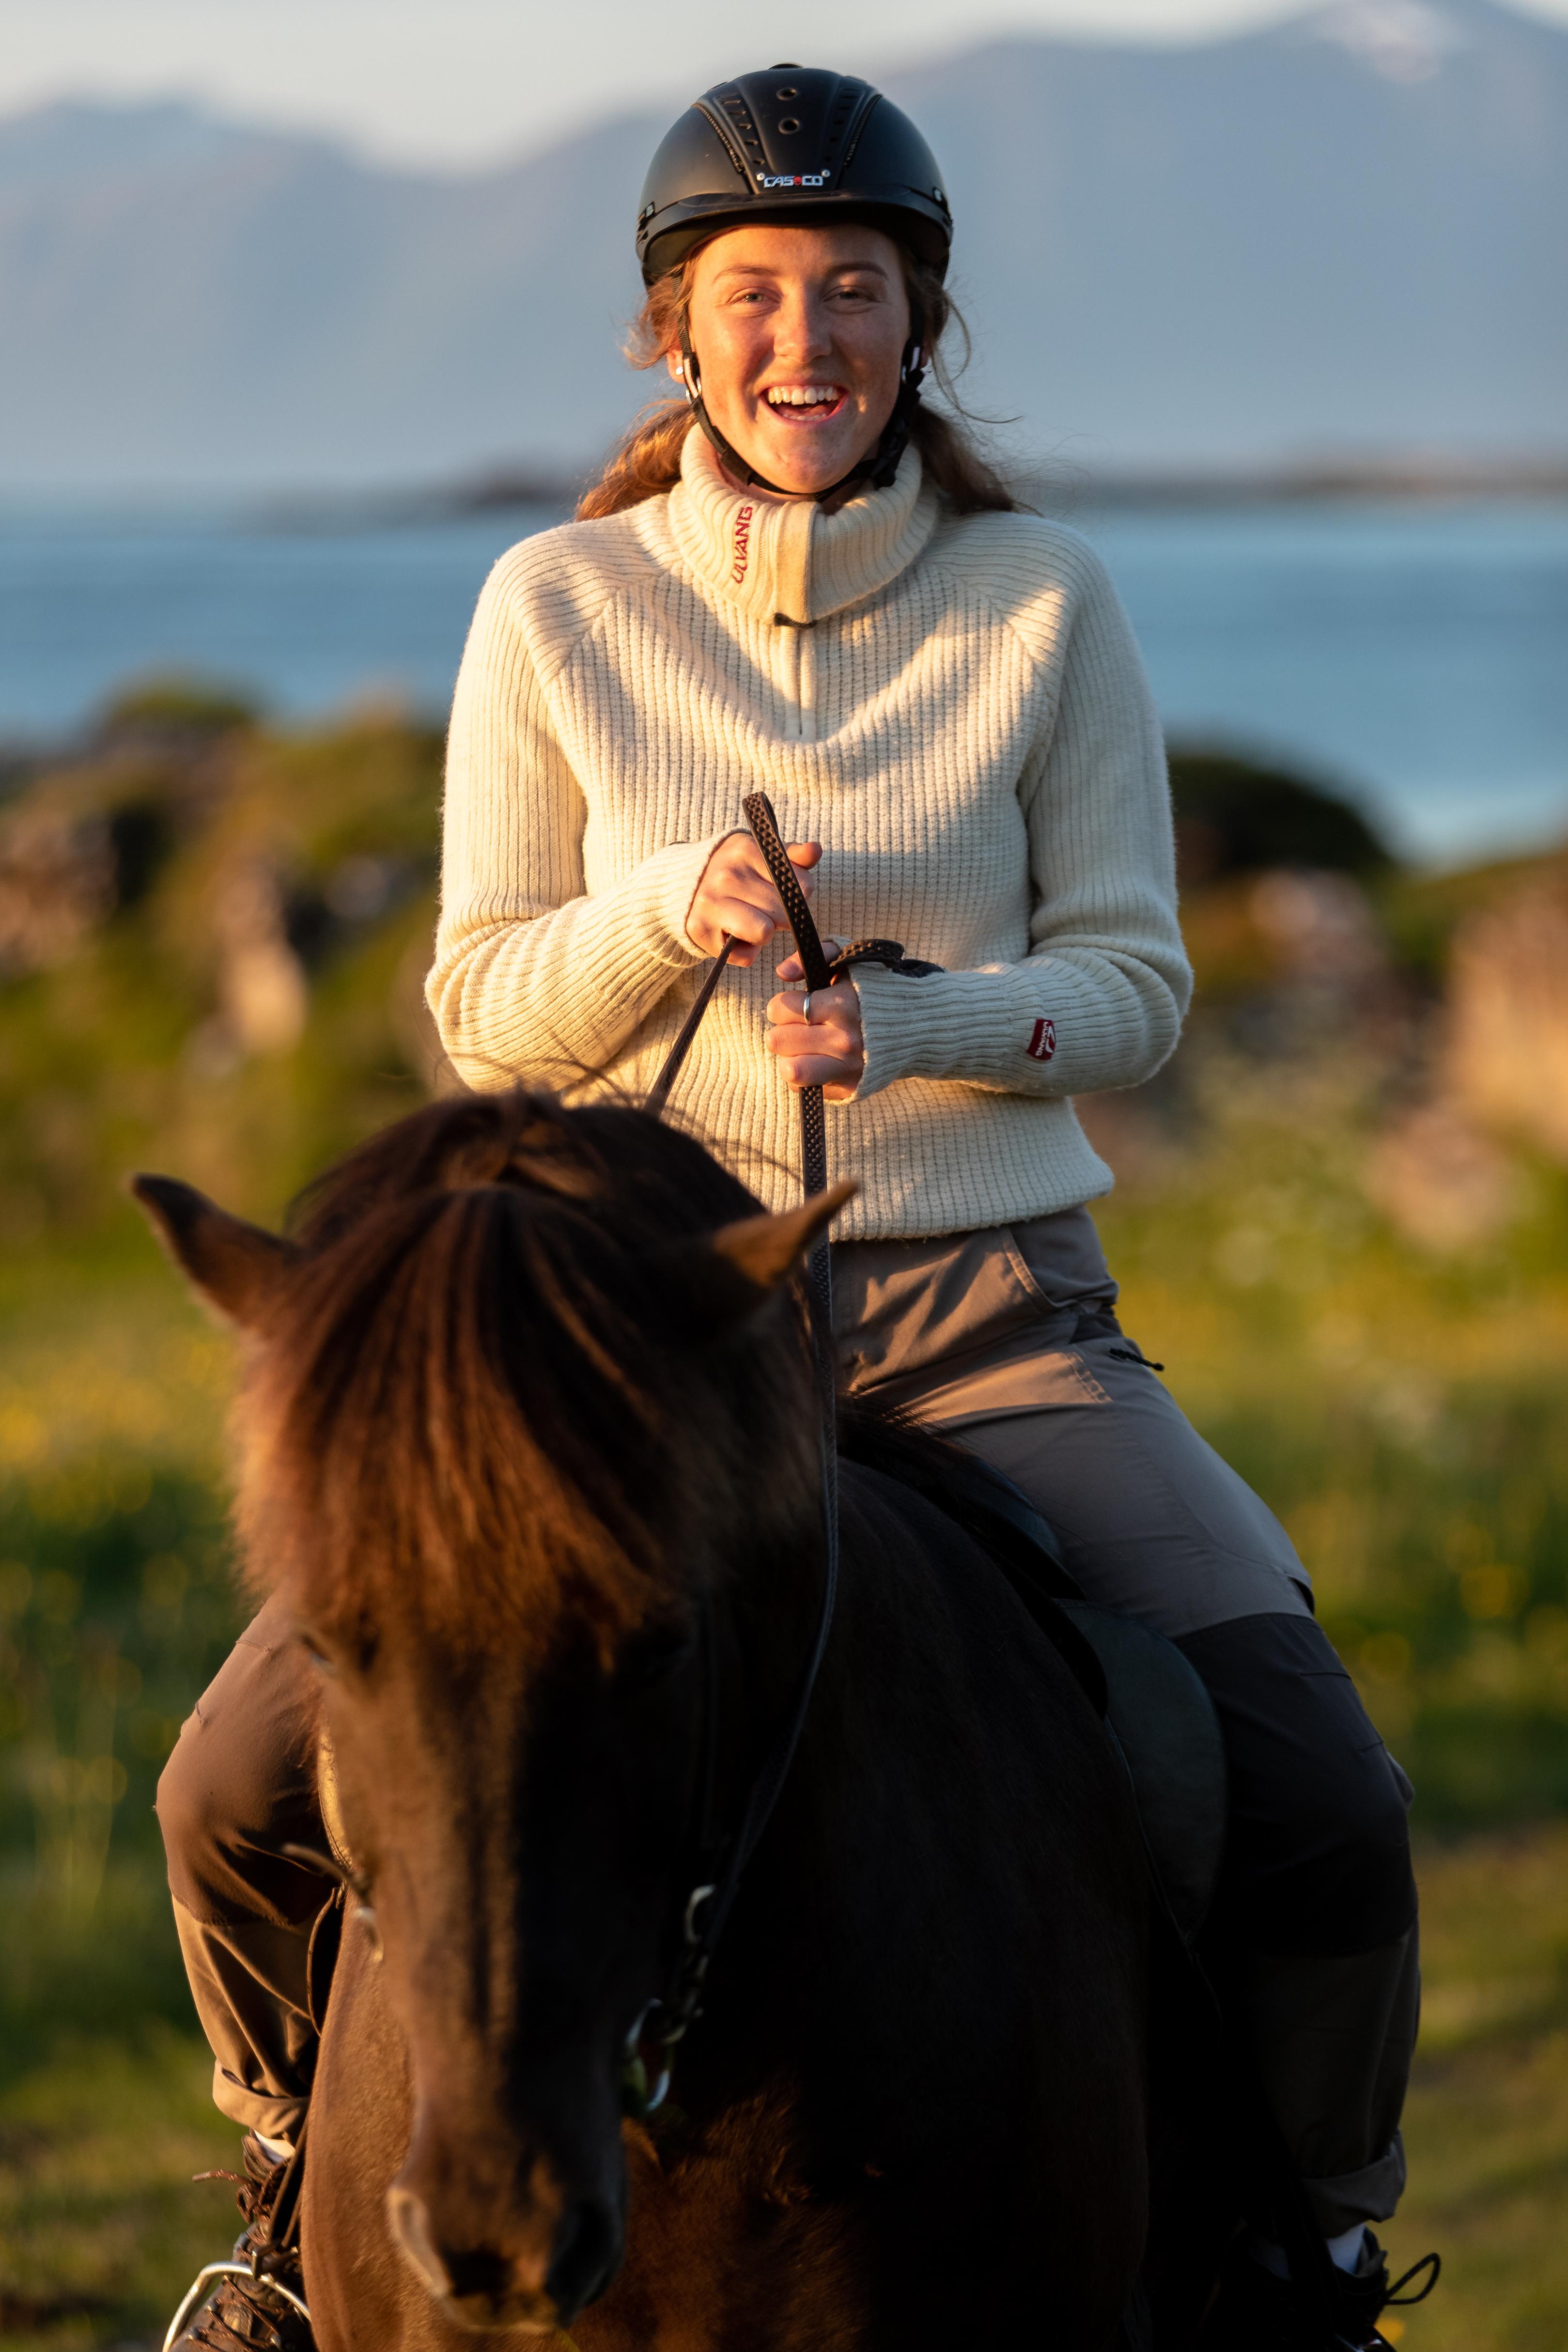 Horse ladies riding cruel Olympics 2021: